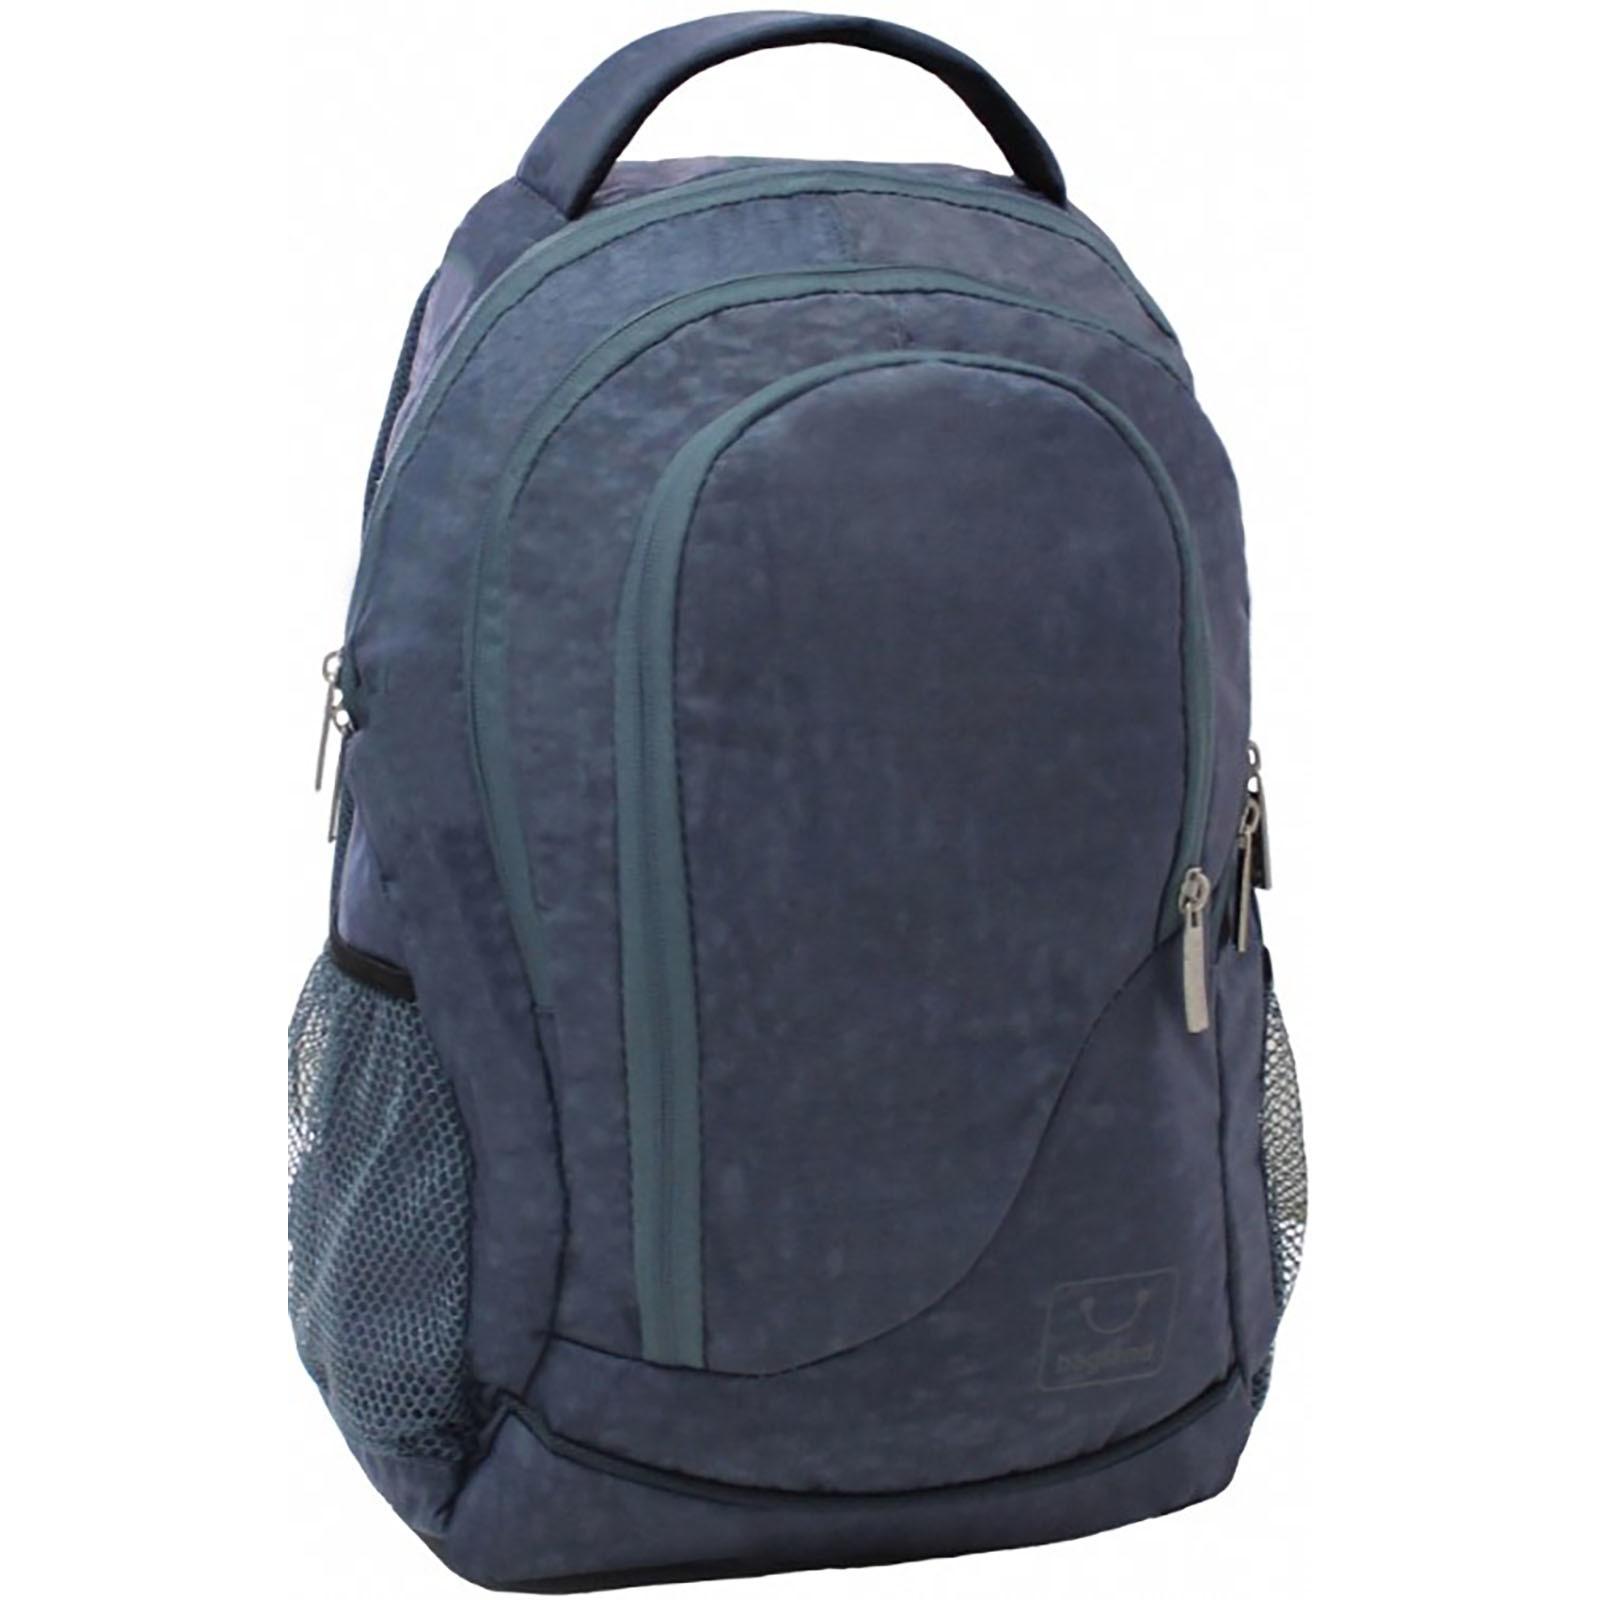 Городские рюкзаки Рюкзак Bagland Бис 21 л. Темно серый (0055670) Screenshot_7.jpg